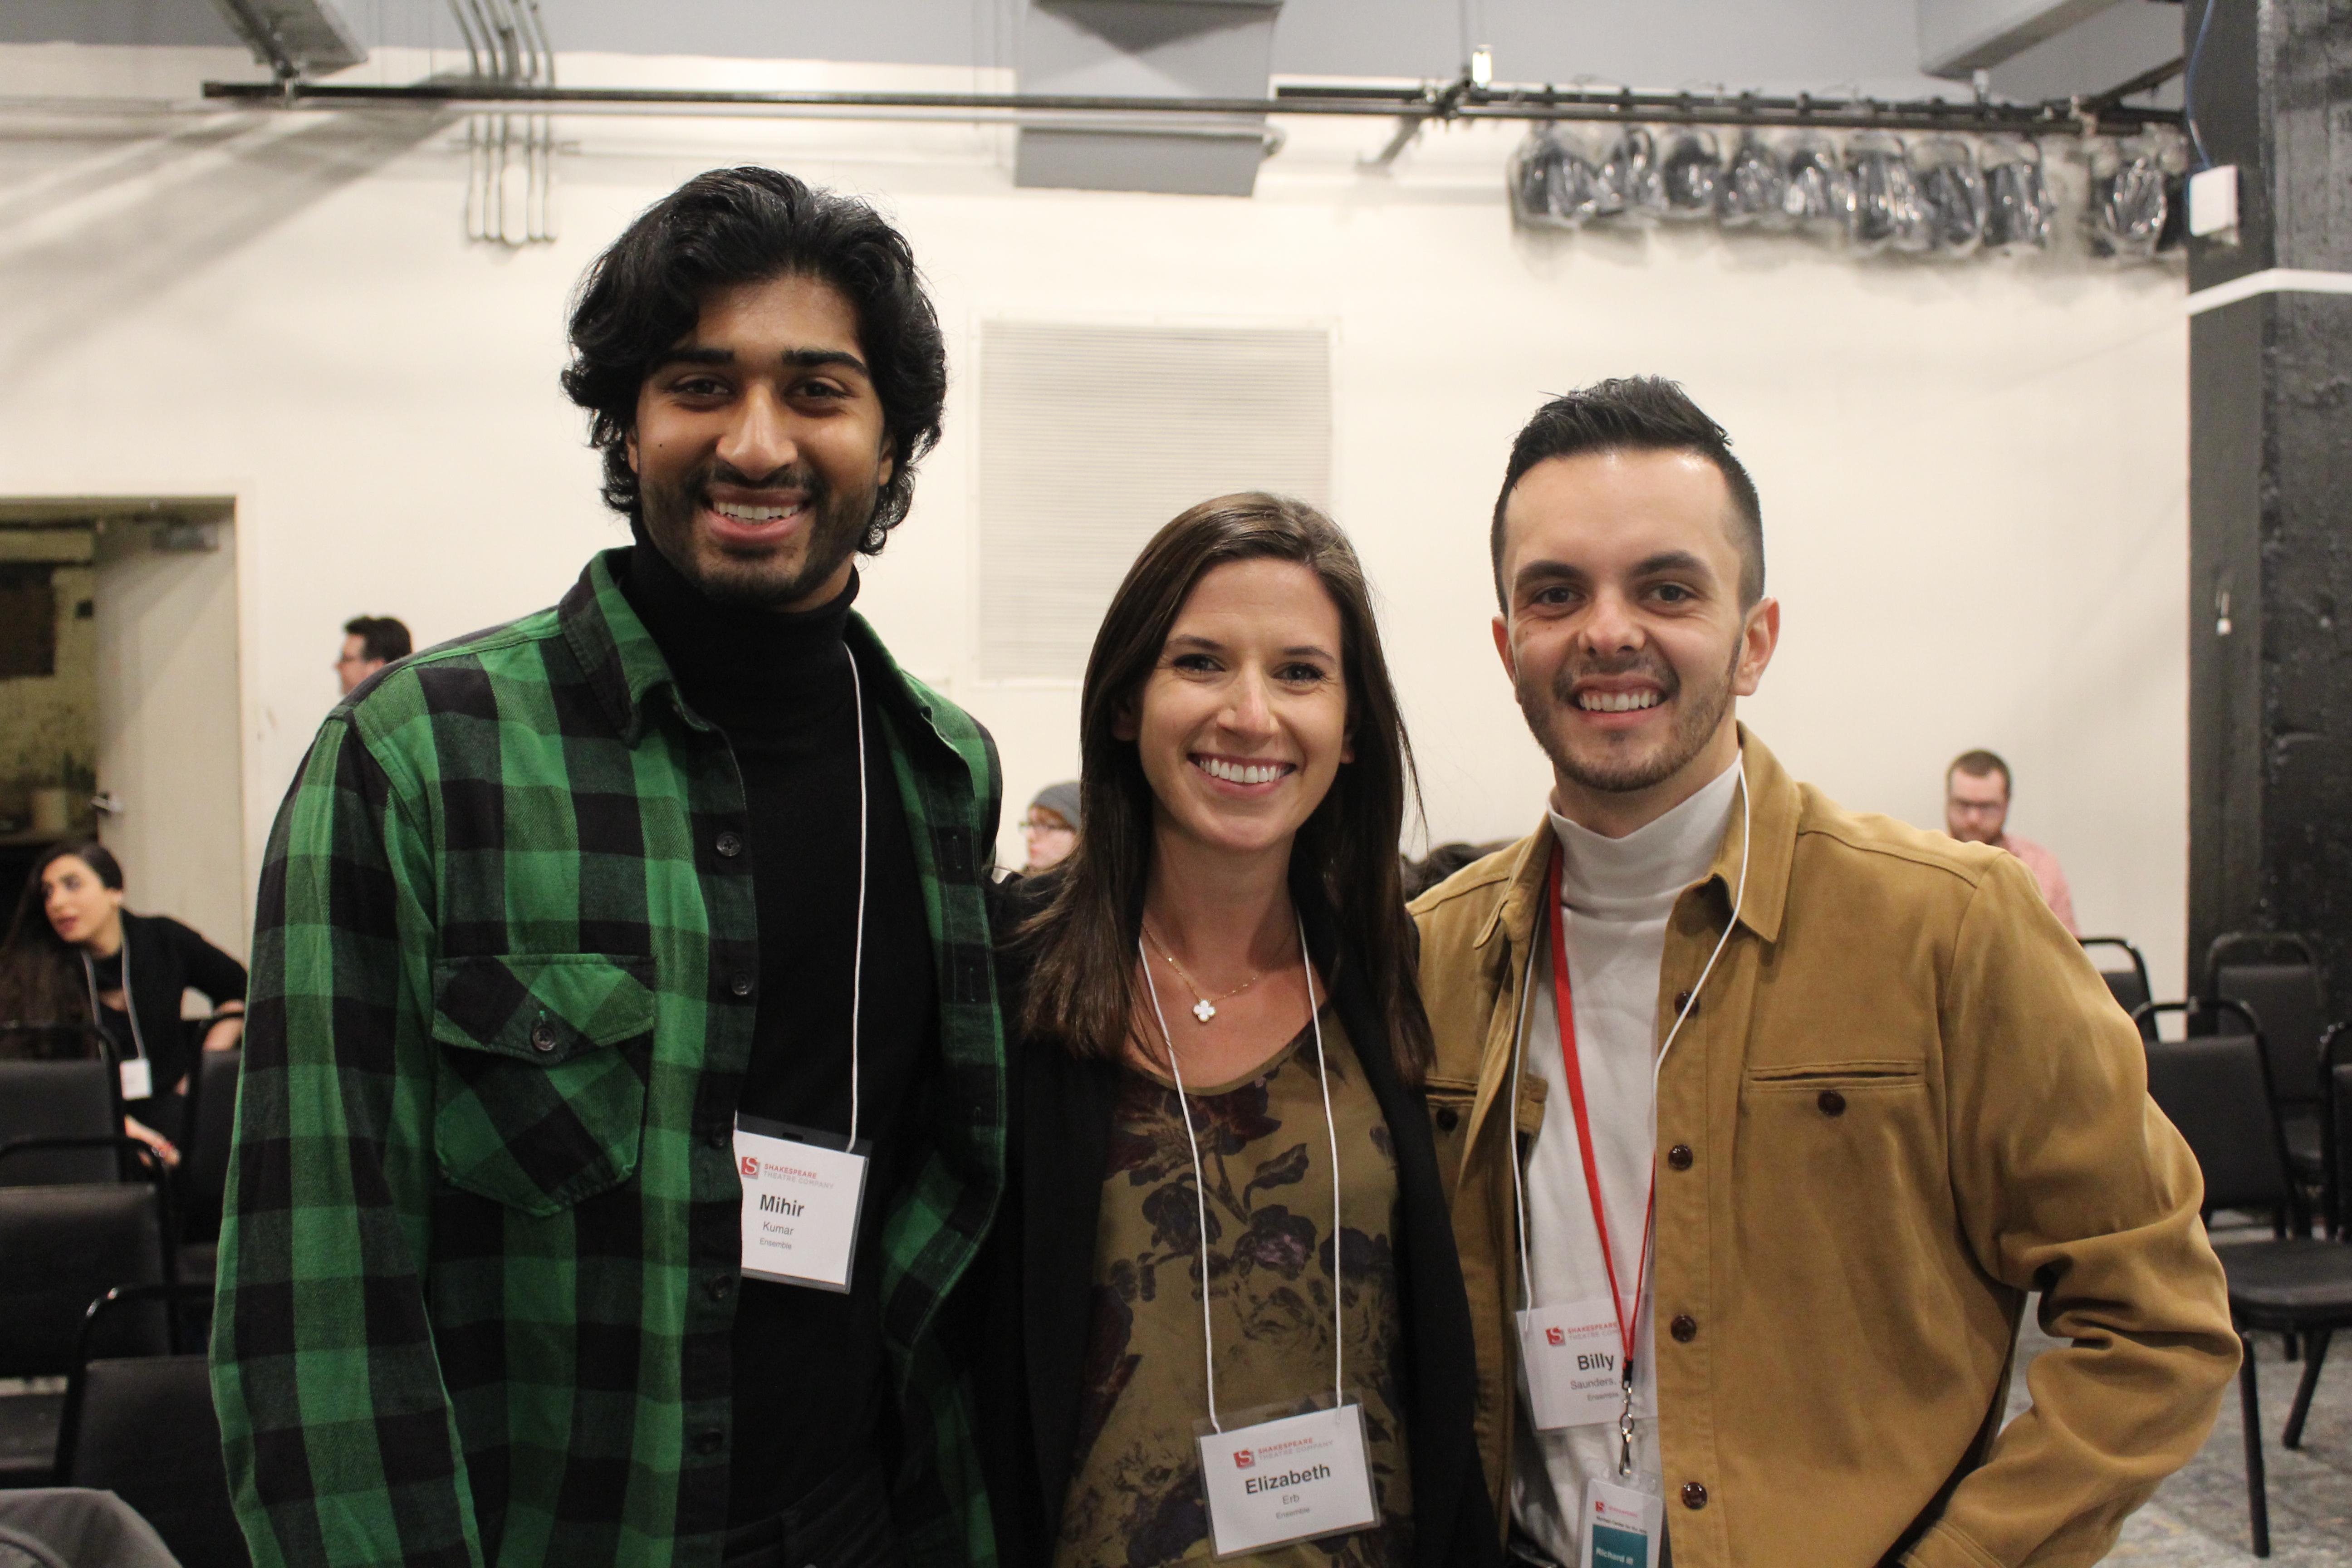 Photo of Mihir Kumar (Ensemble), Elizabeth Erb (Ensemble) and Billy Saunders, Jr(Ensemble) in rehearsal for Richard the Third.